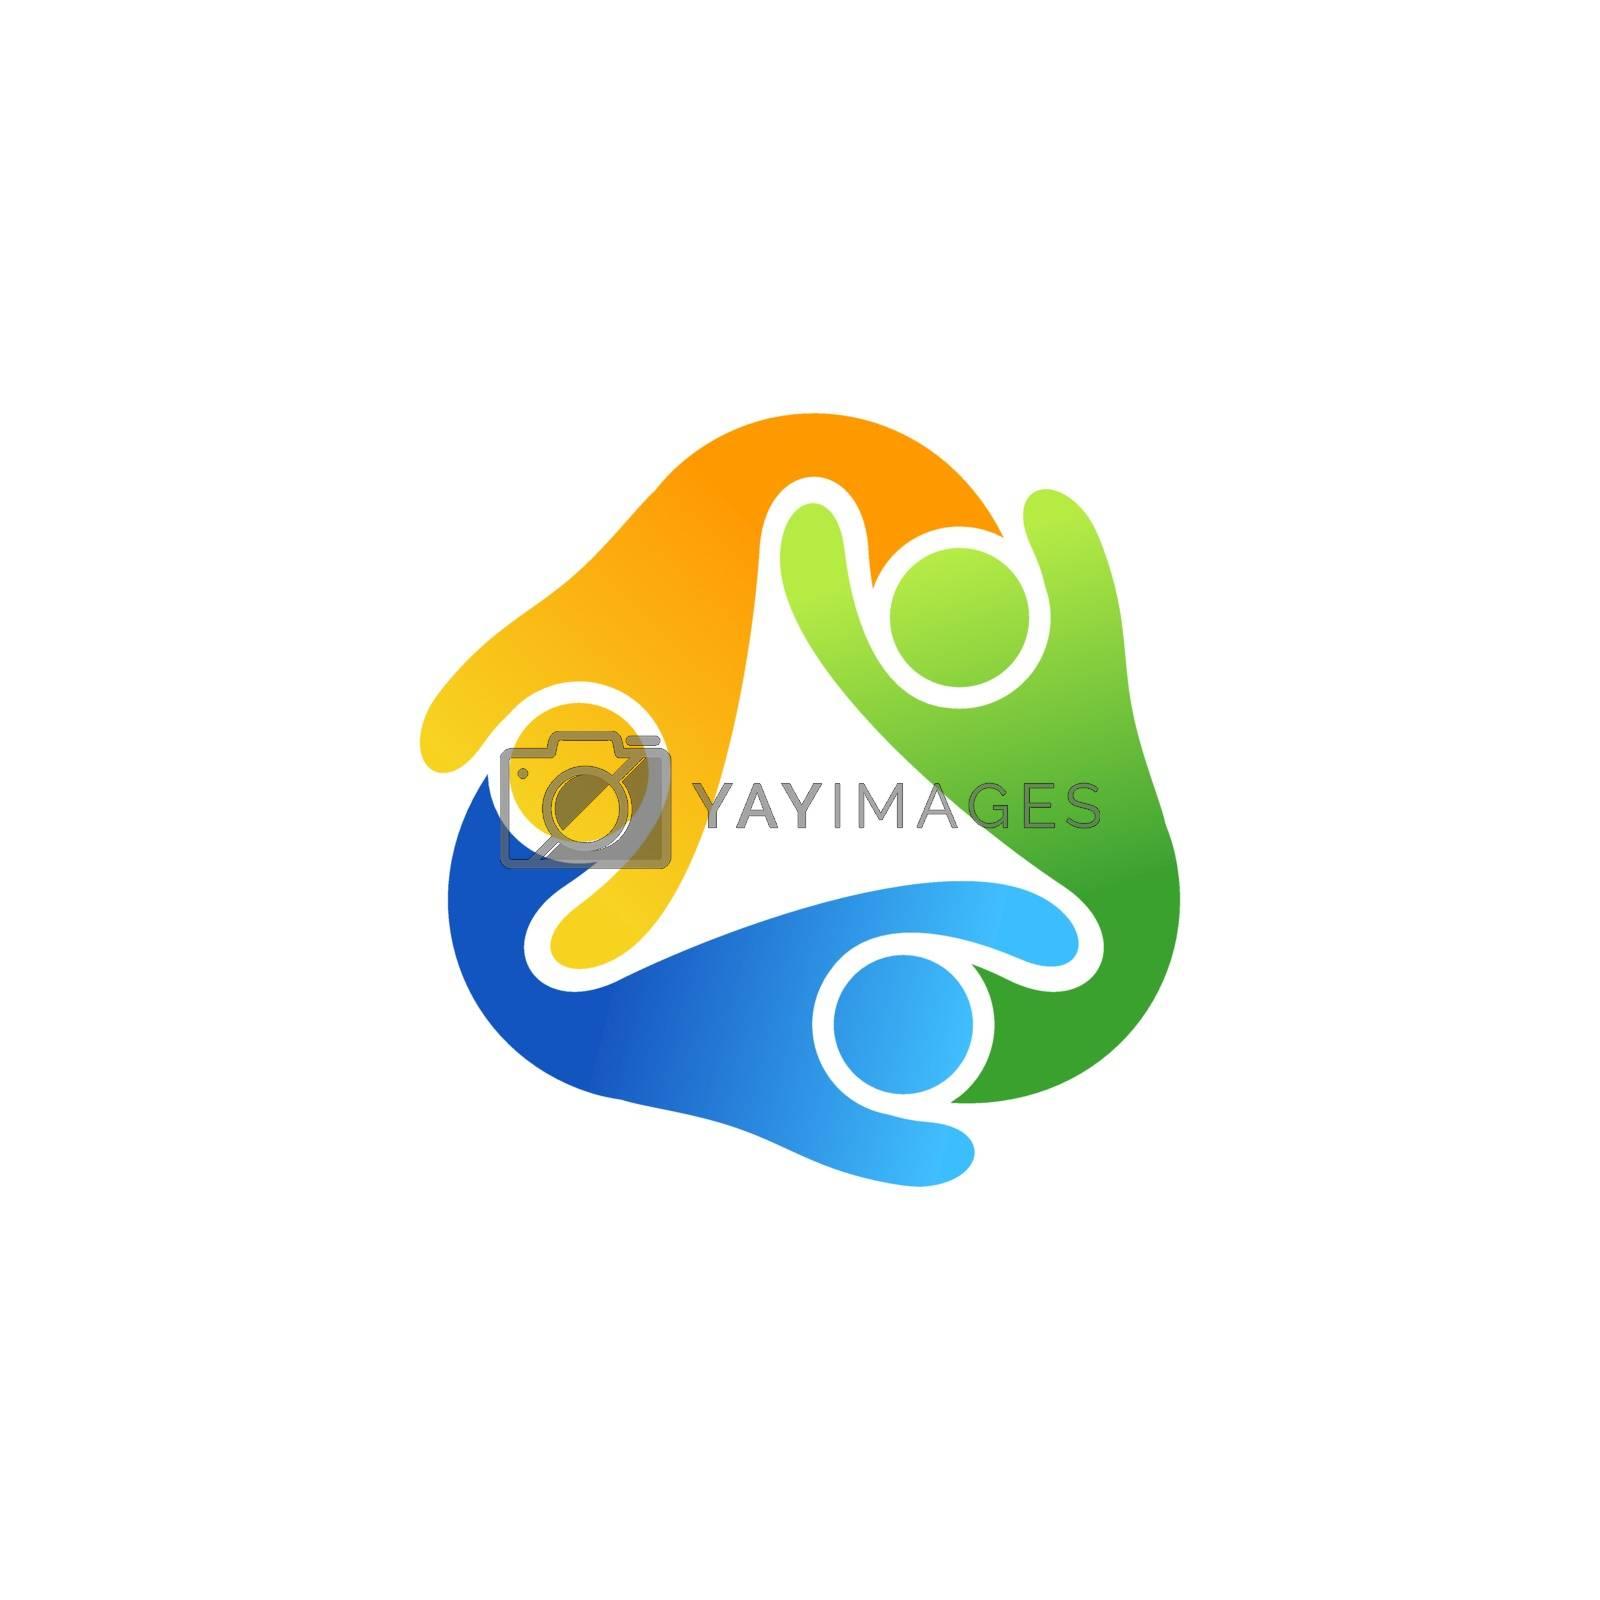 global teamwork people connection colored logo symbol icon vector design illustration